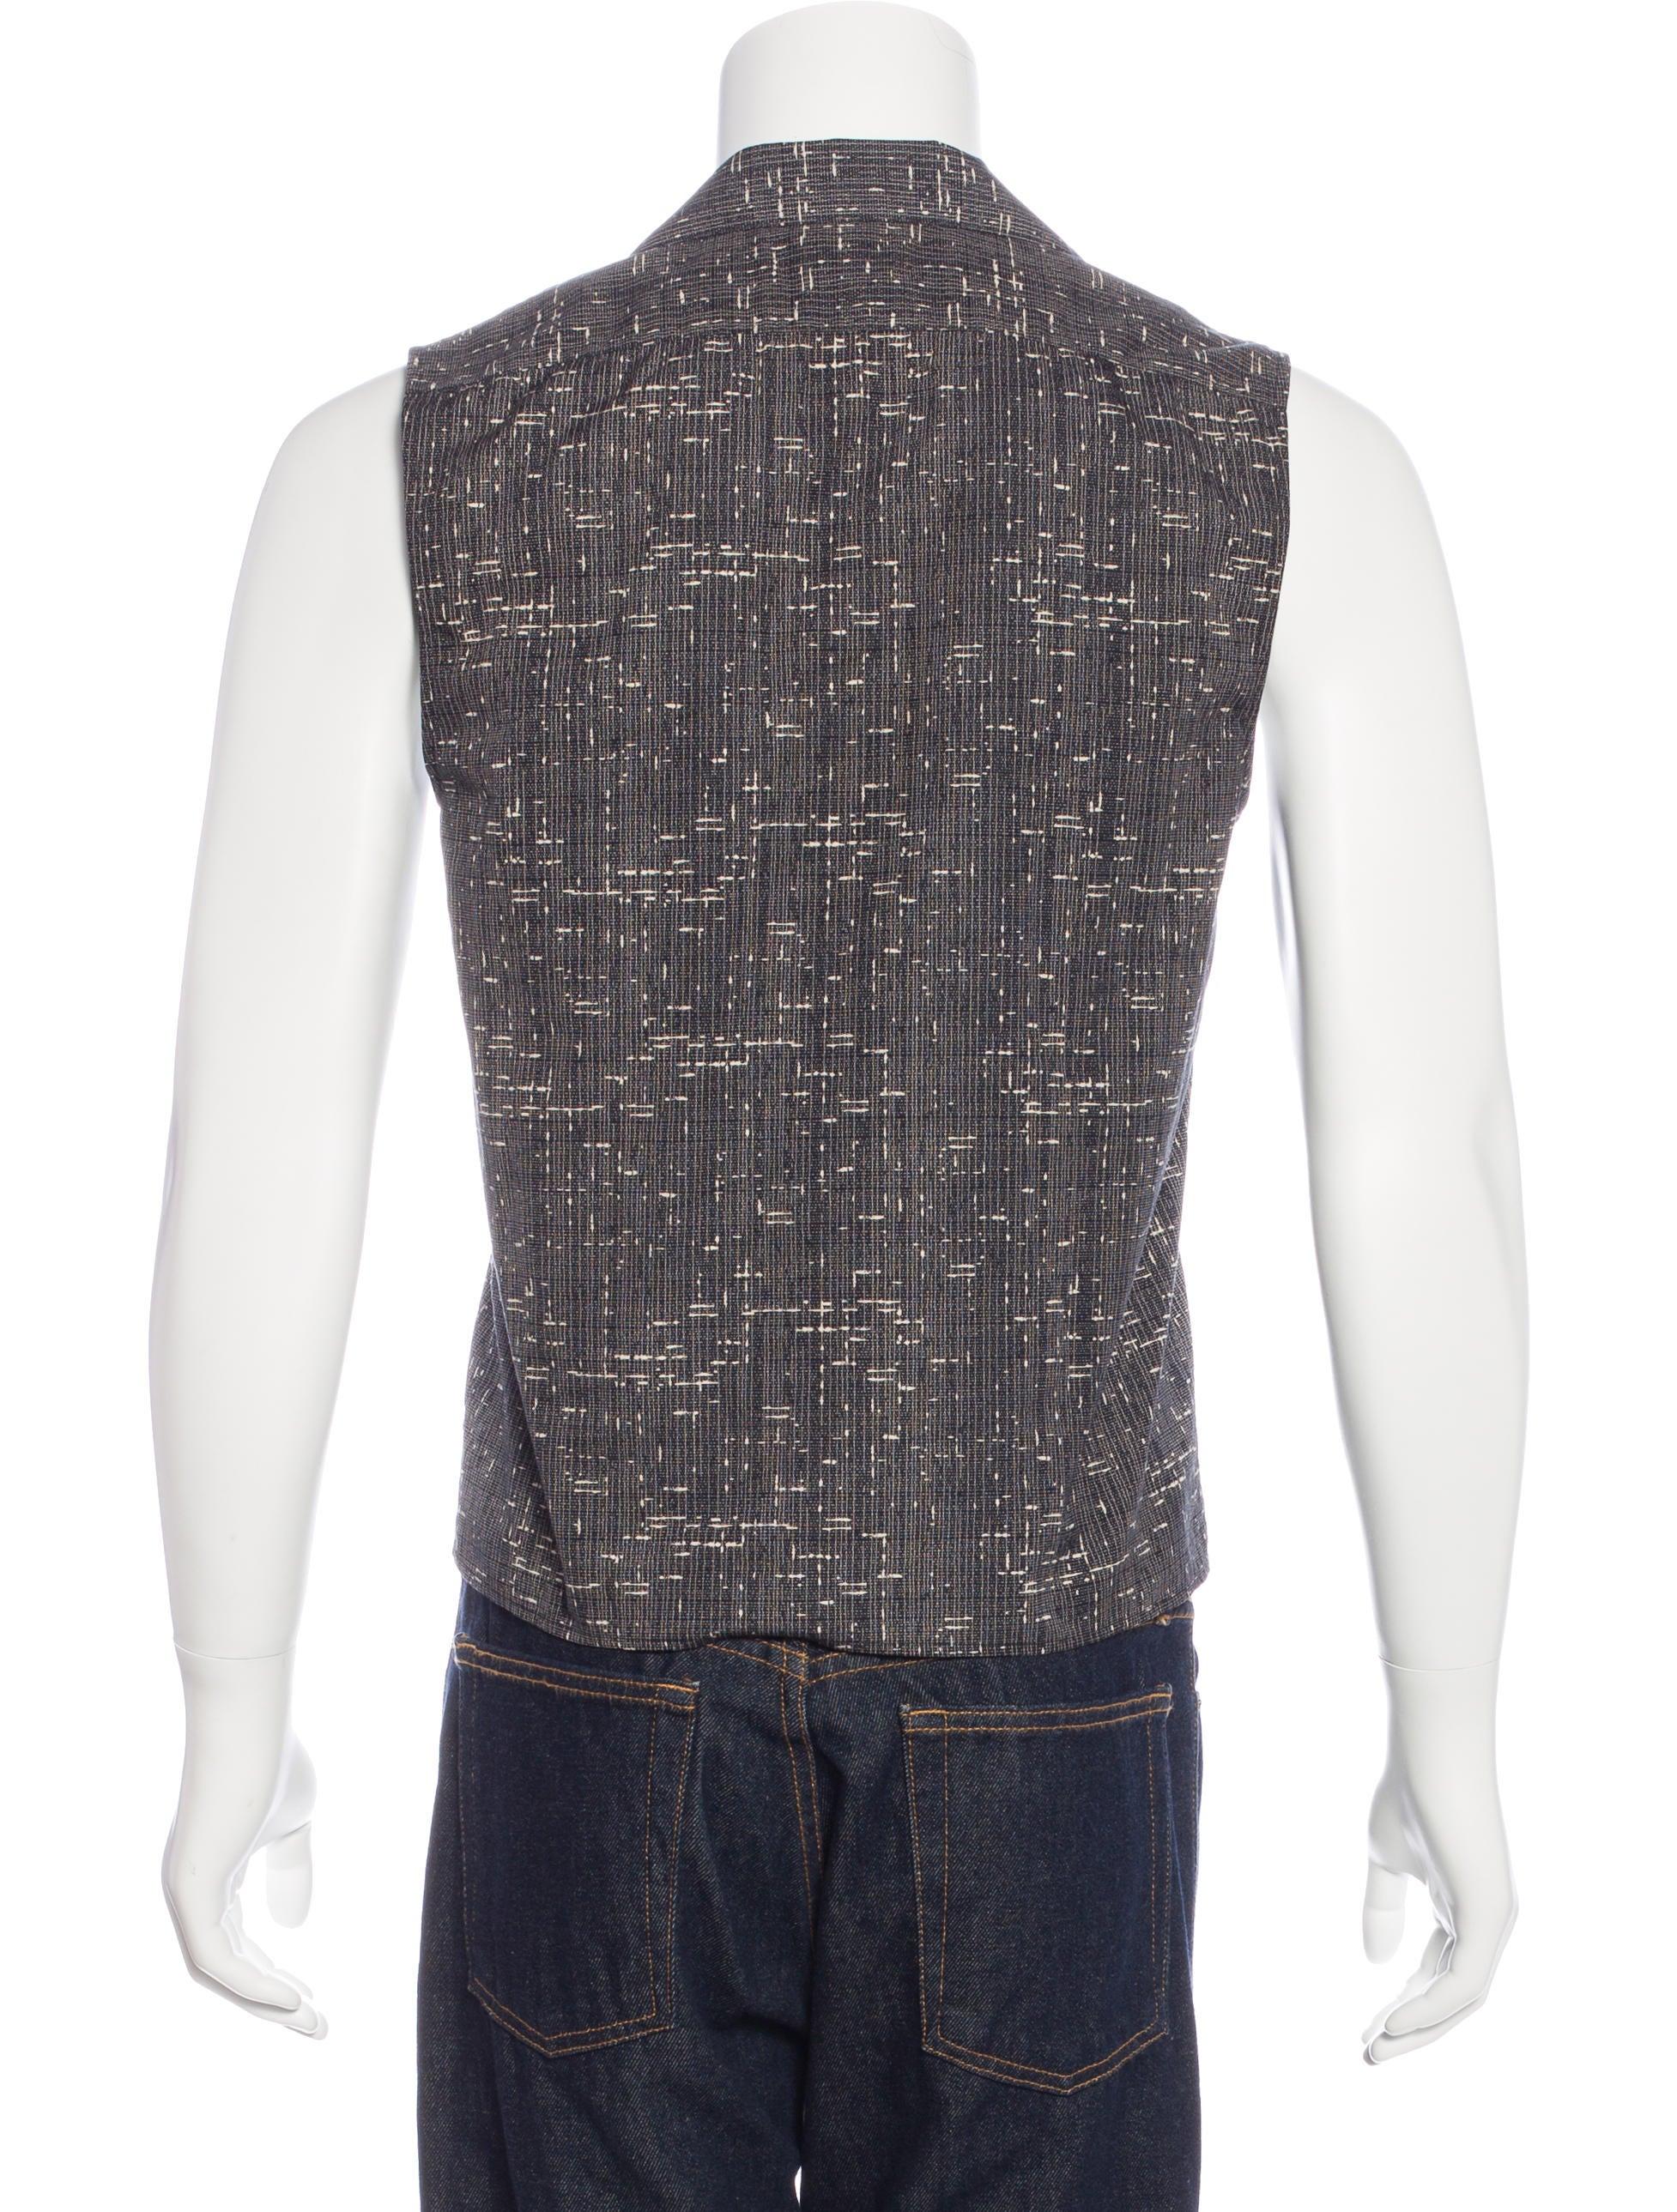 Saint laurent sleeveless camp collar shirt clothing for Sleeveless white shirt with collar